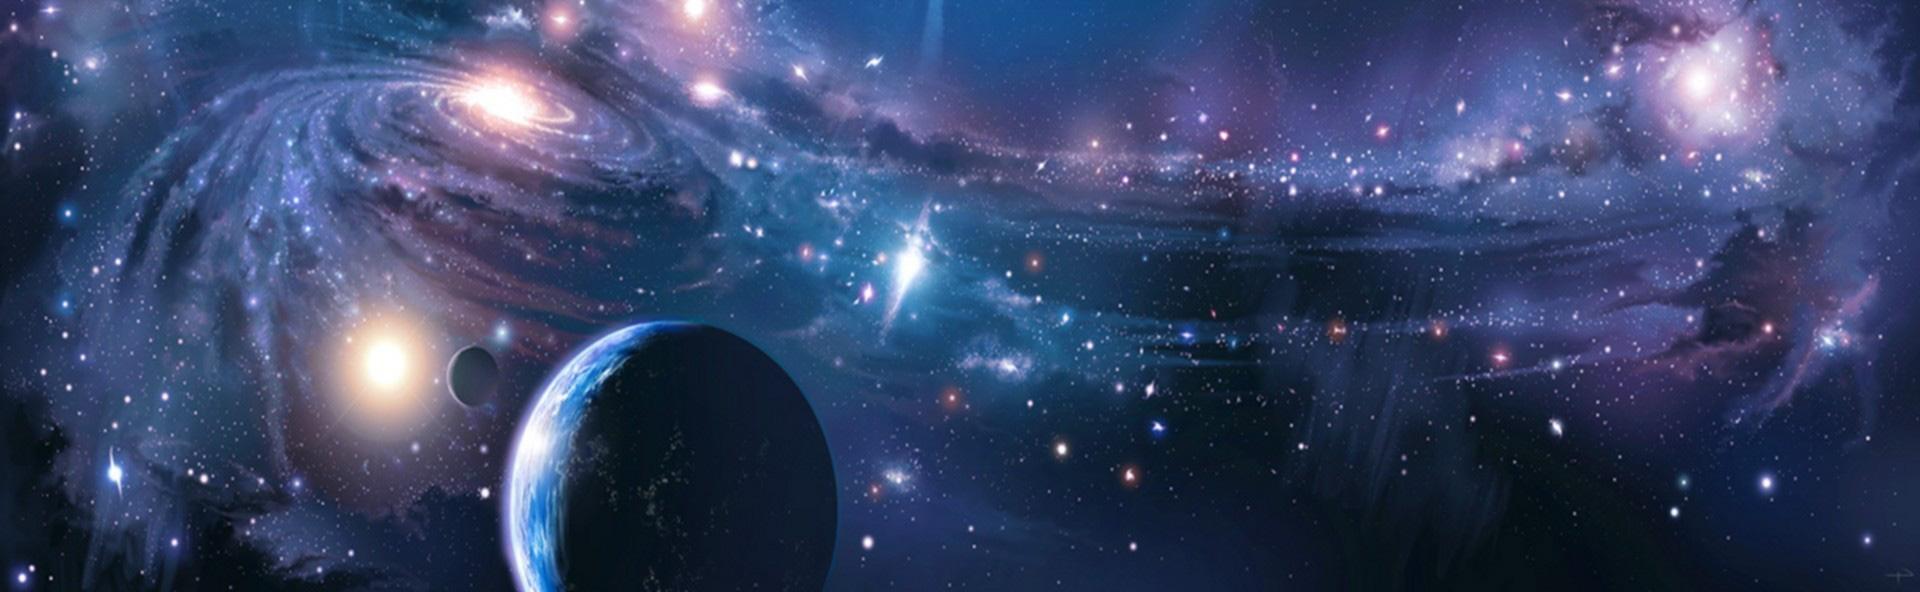 Cosmos_edited1